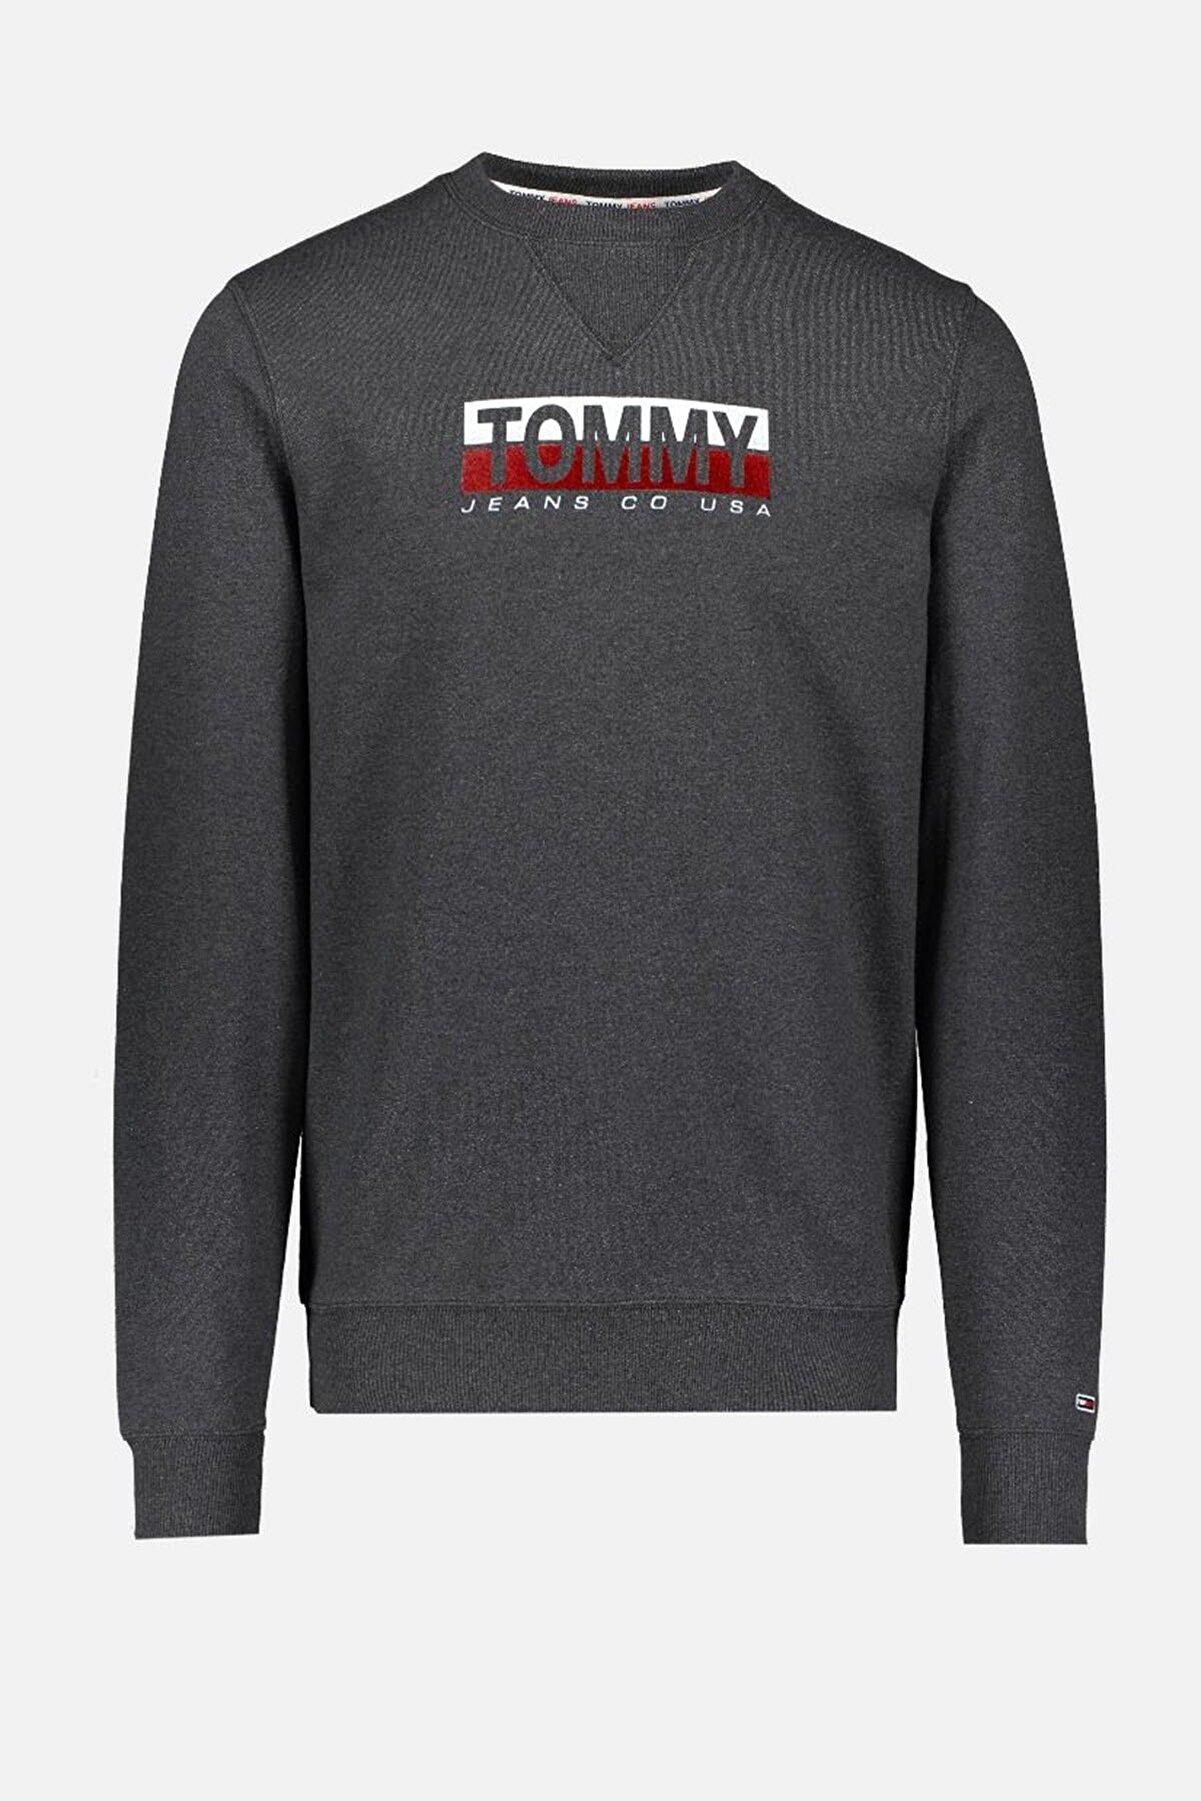 Tommy Hilfiger Erkek Gri Sweatshirt Tjm Essentıal Splıt Box Crew DM0DM08732